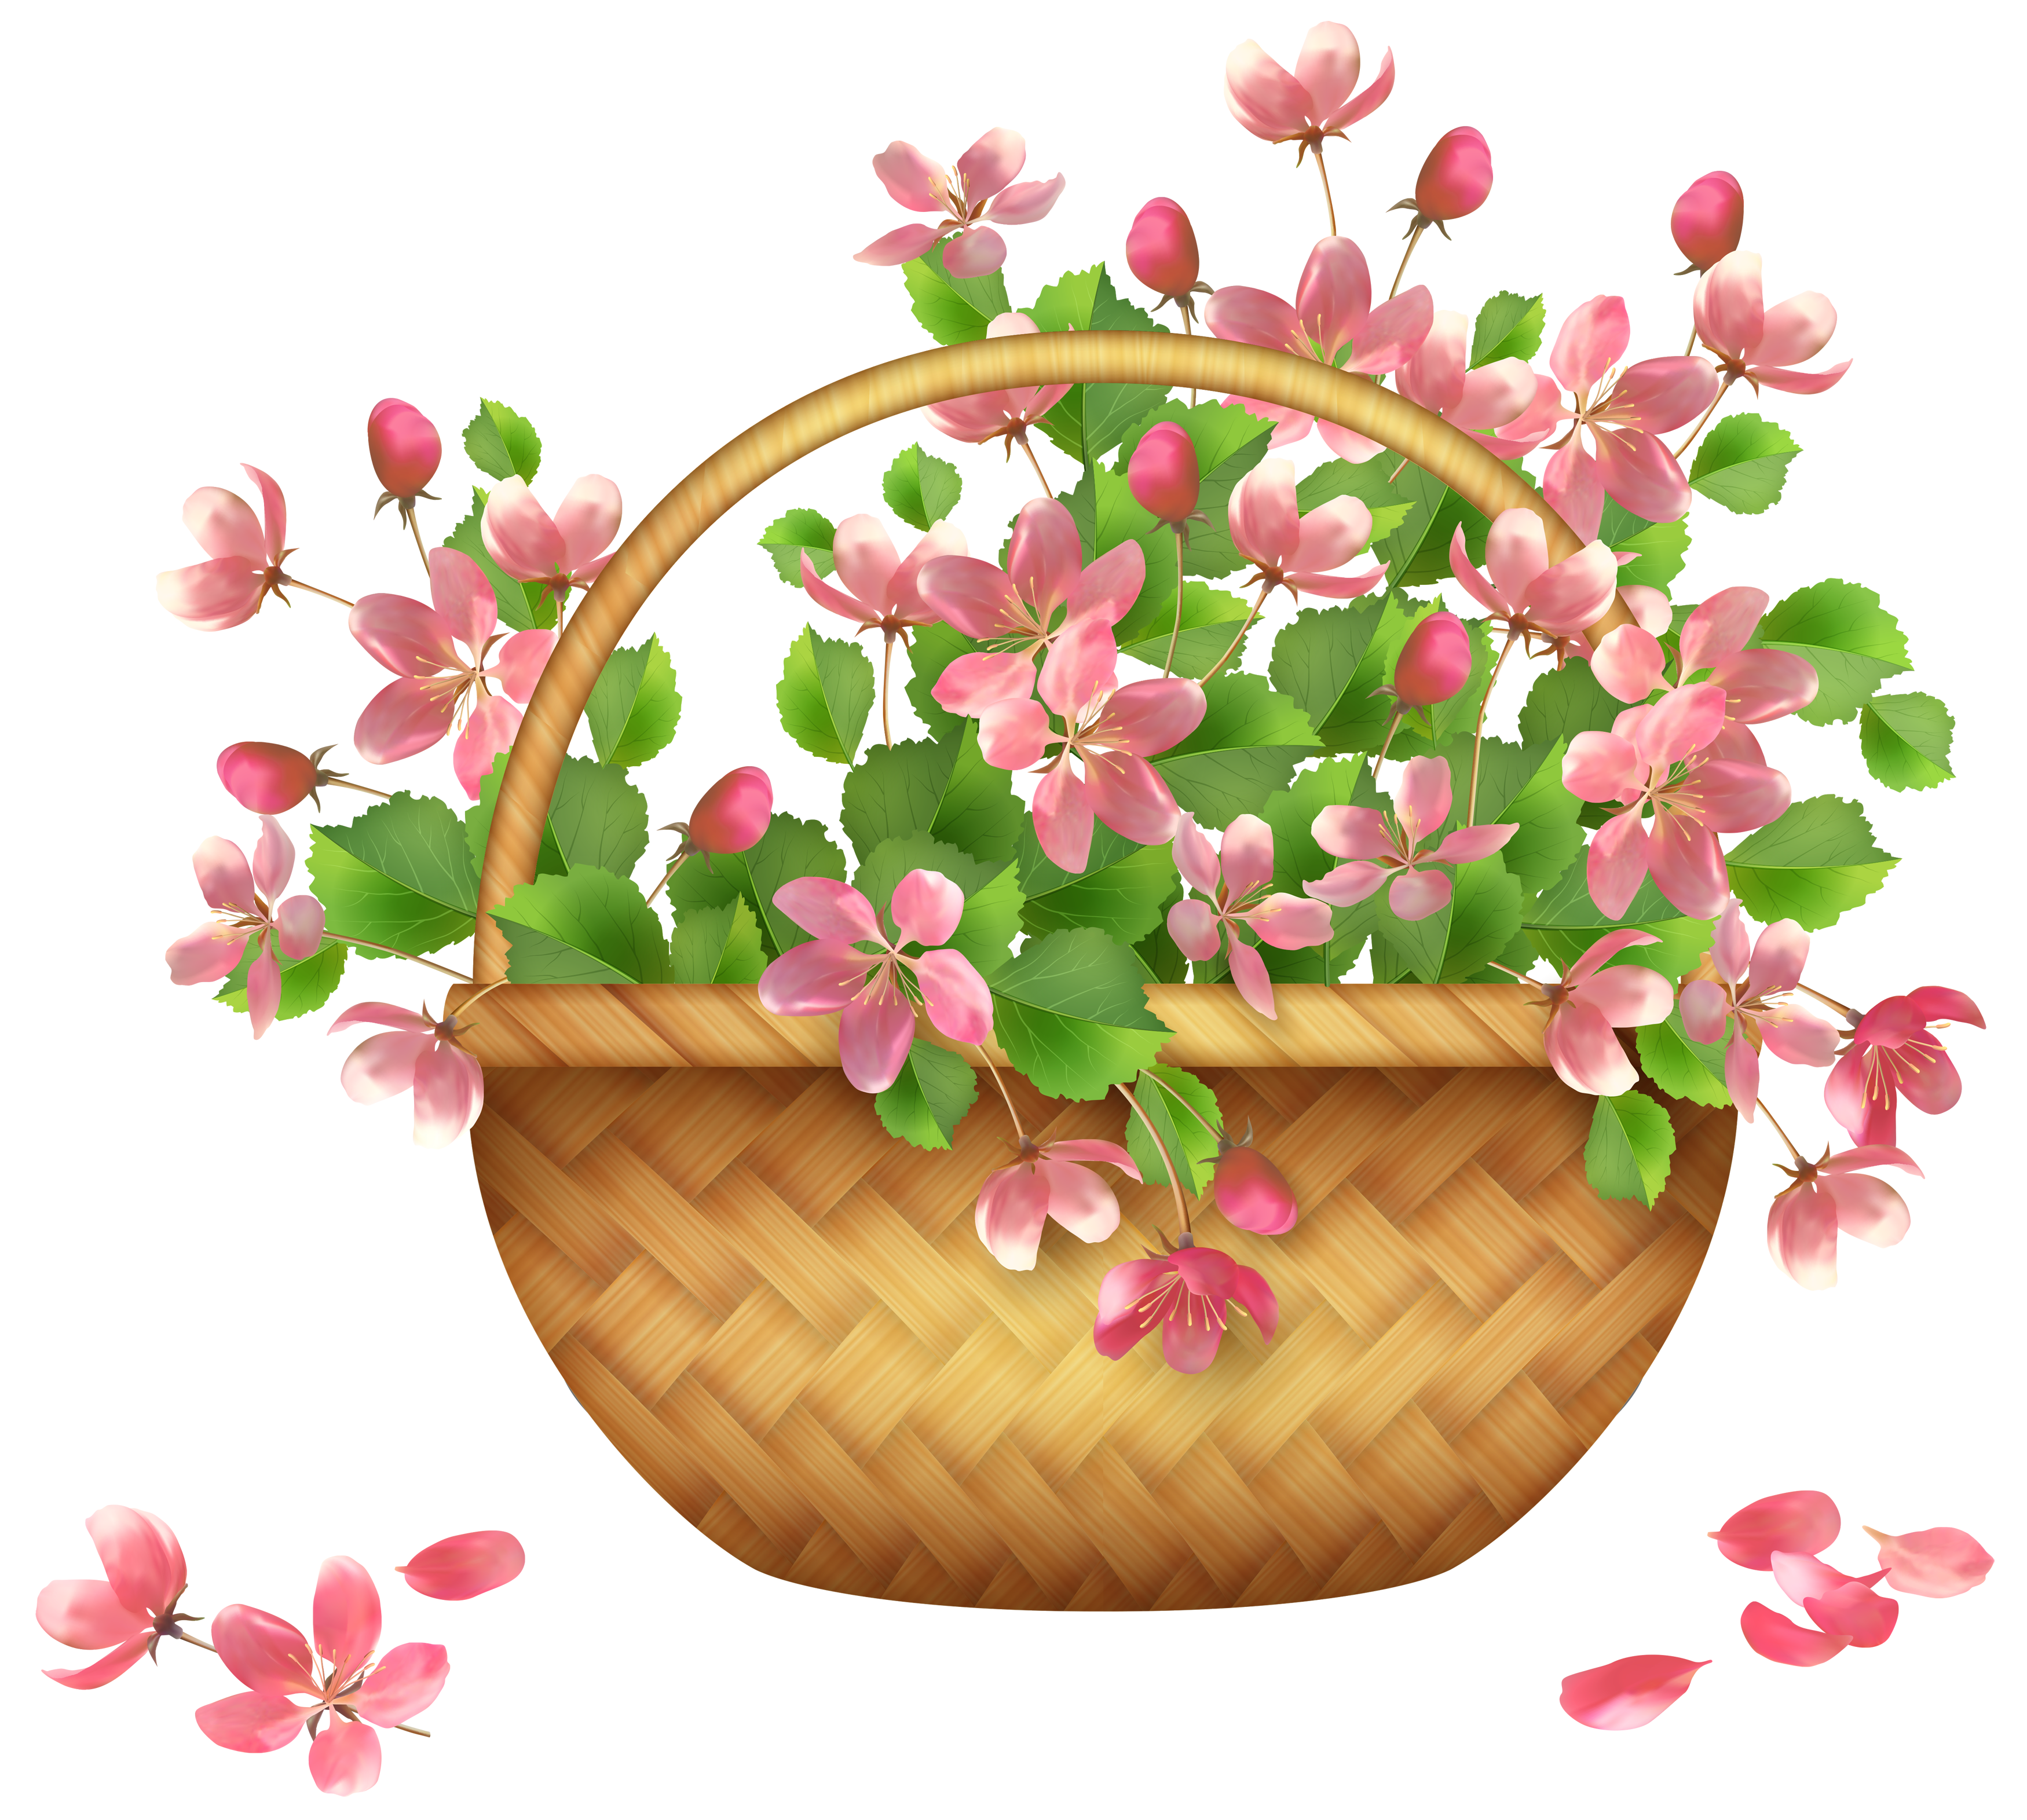 Flower basket png gallery. Food clipart spring